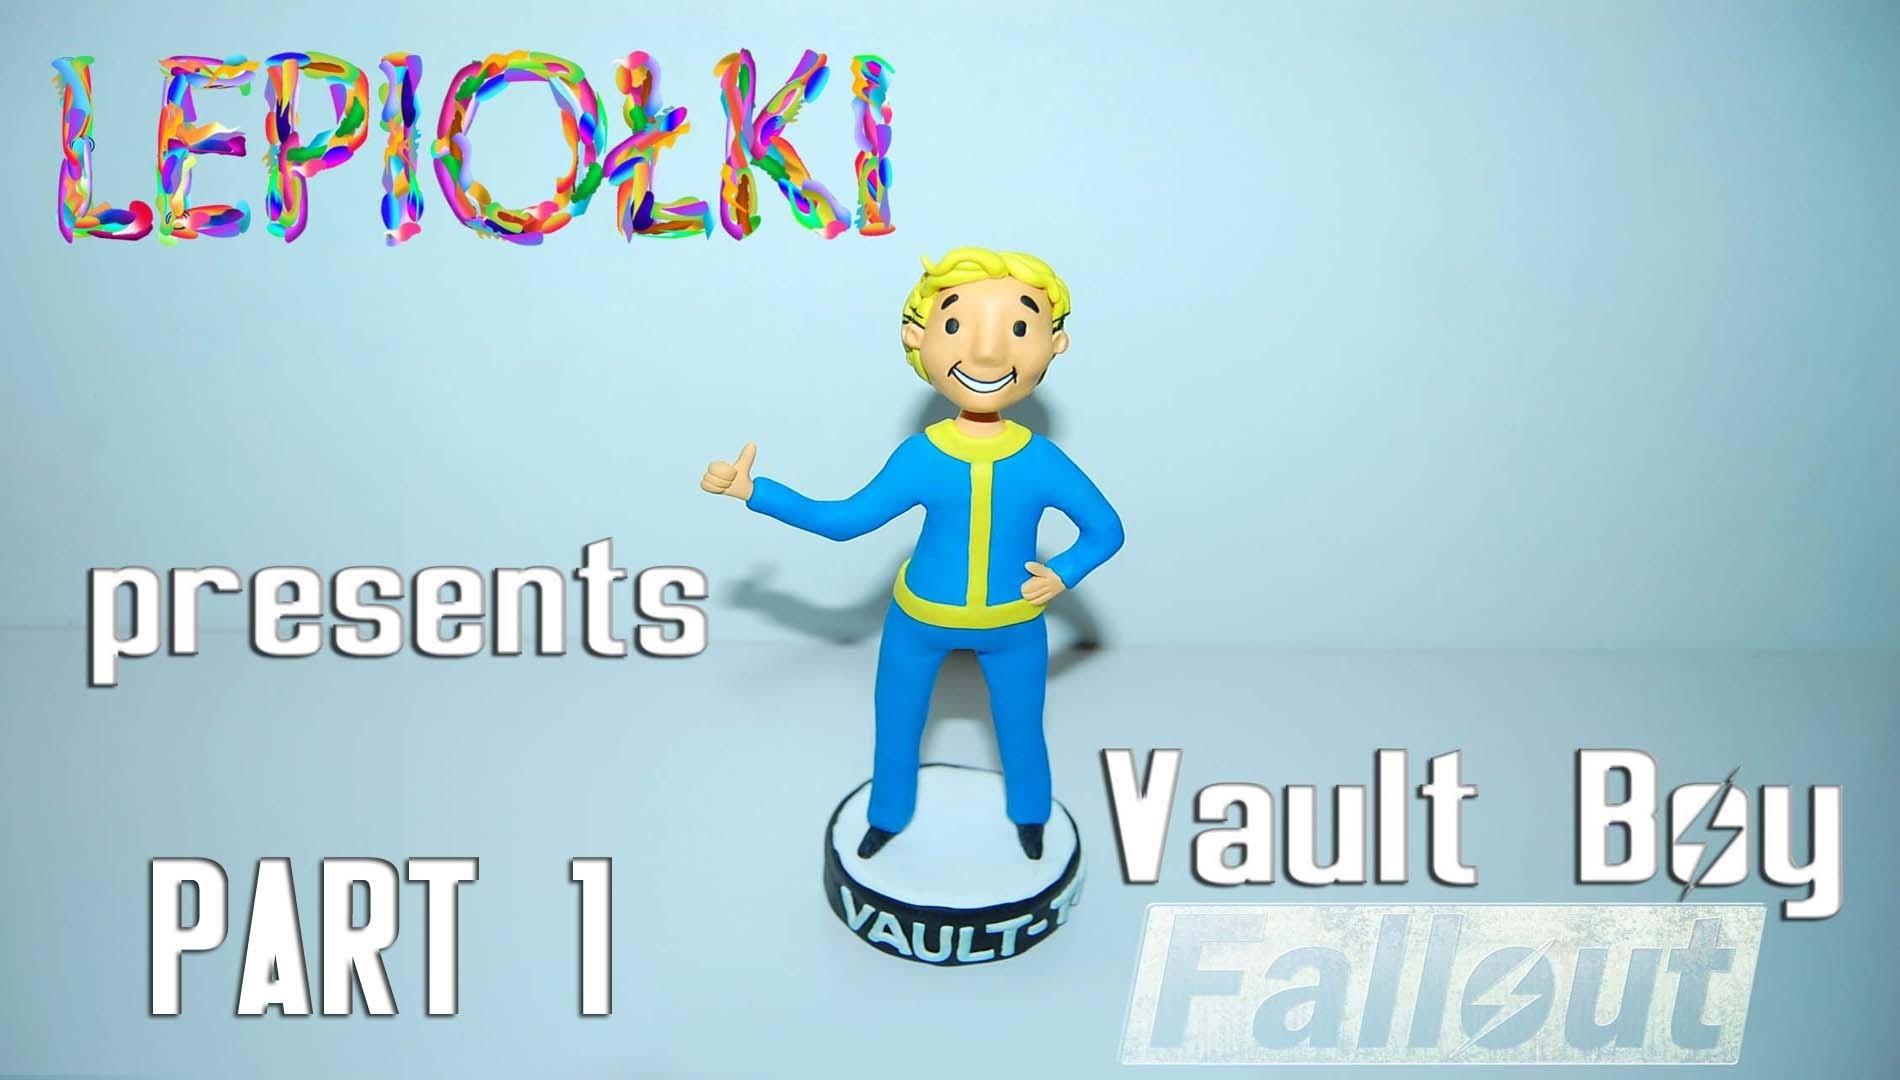 TUTORIAL: Vault boy ( Fallout) by  lepiołki  PART 1 polymer clay, z modeliny, made hand